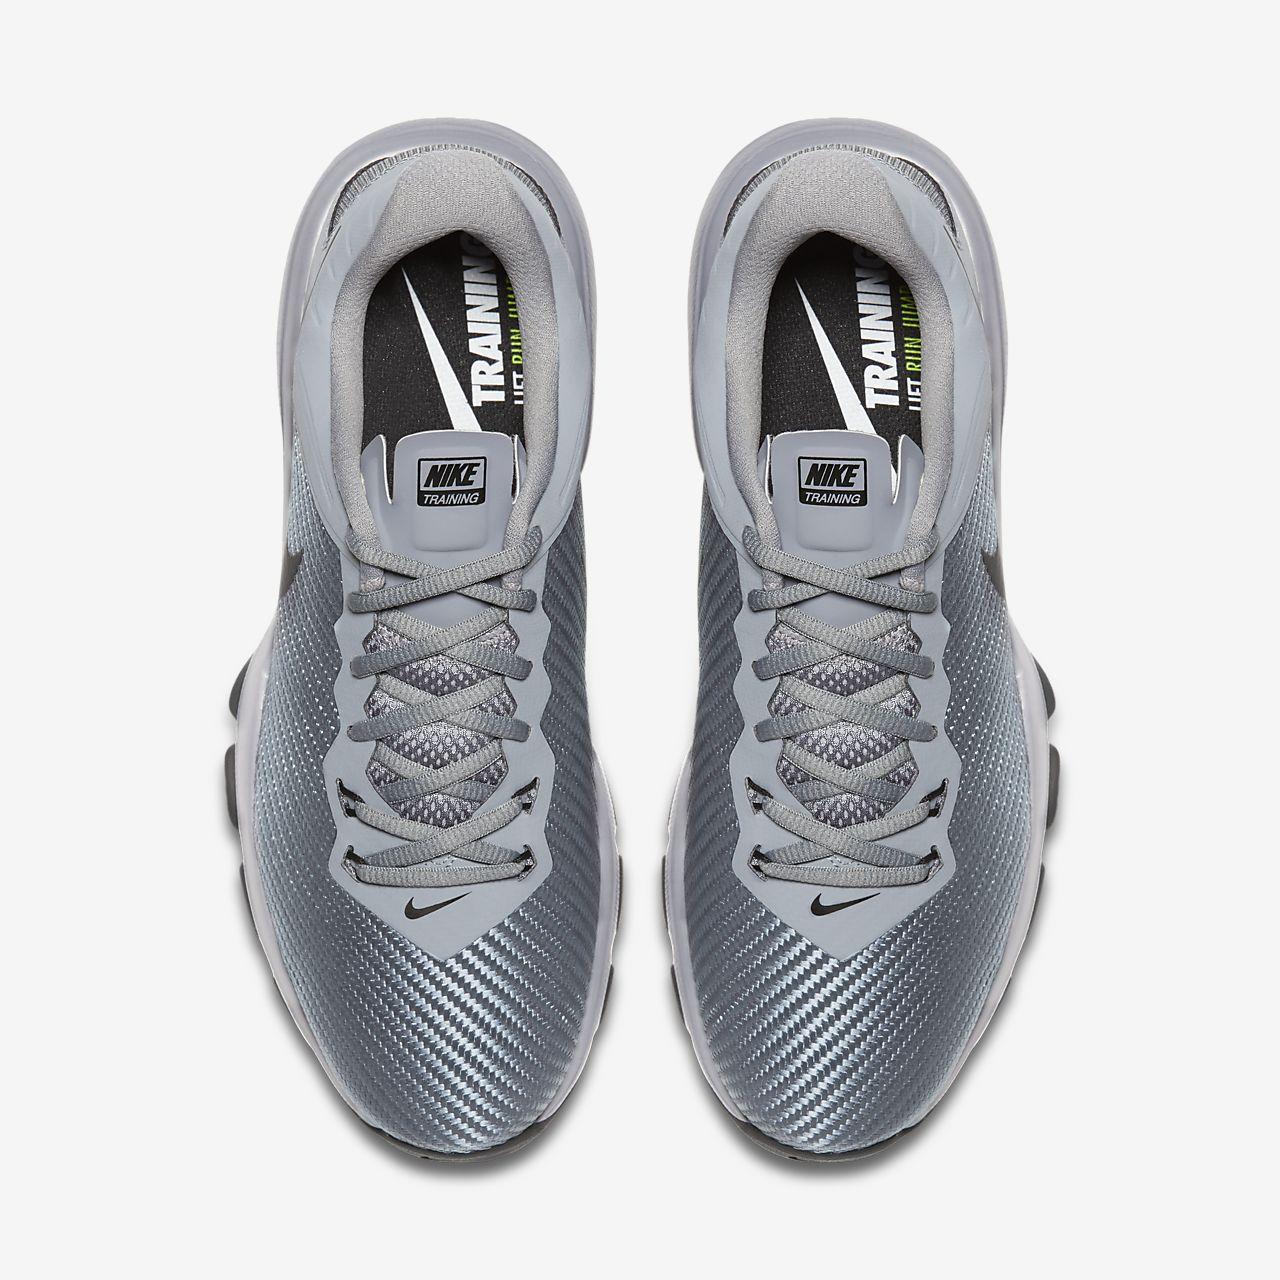 22dfe55bce6fd Calzado de entrenamiento para hombre Nike Air Max Full Ride TR 1.5 ...